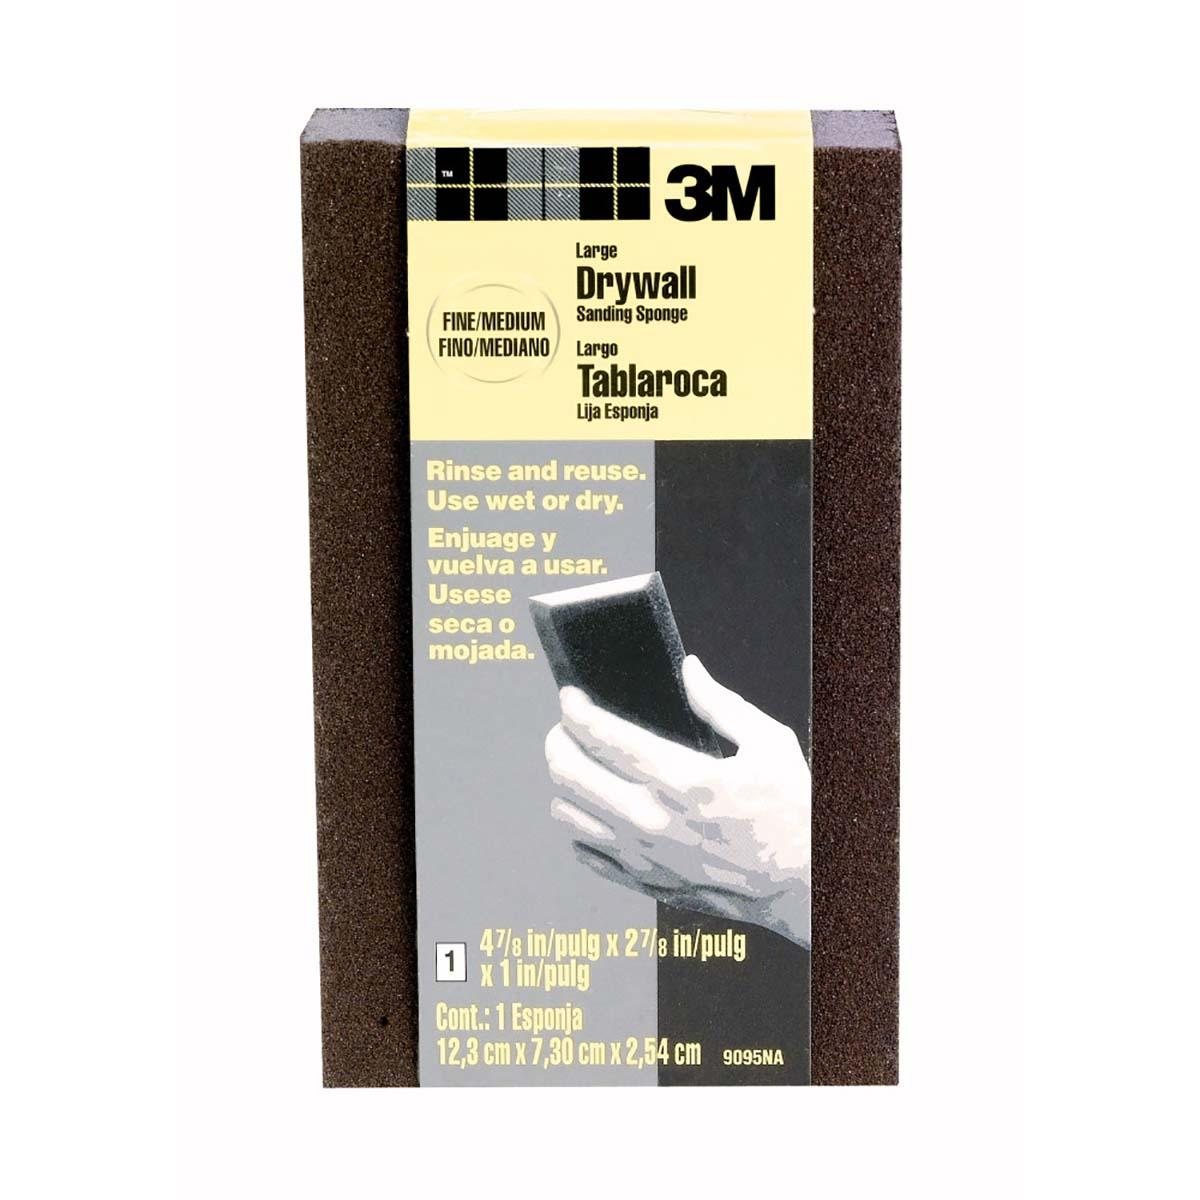 3M Large Area Drywall Sanding Sponge 9095DCNA, 4.875 in x 2.875 in x 1 in, Fine Medium